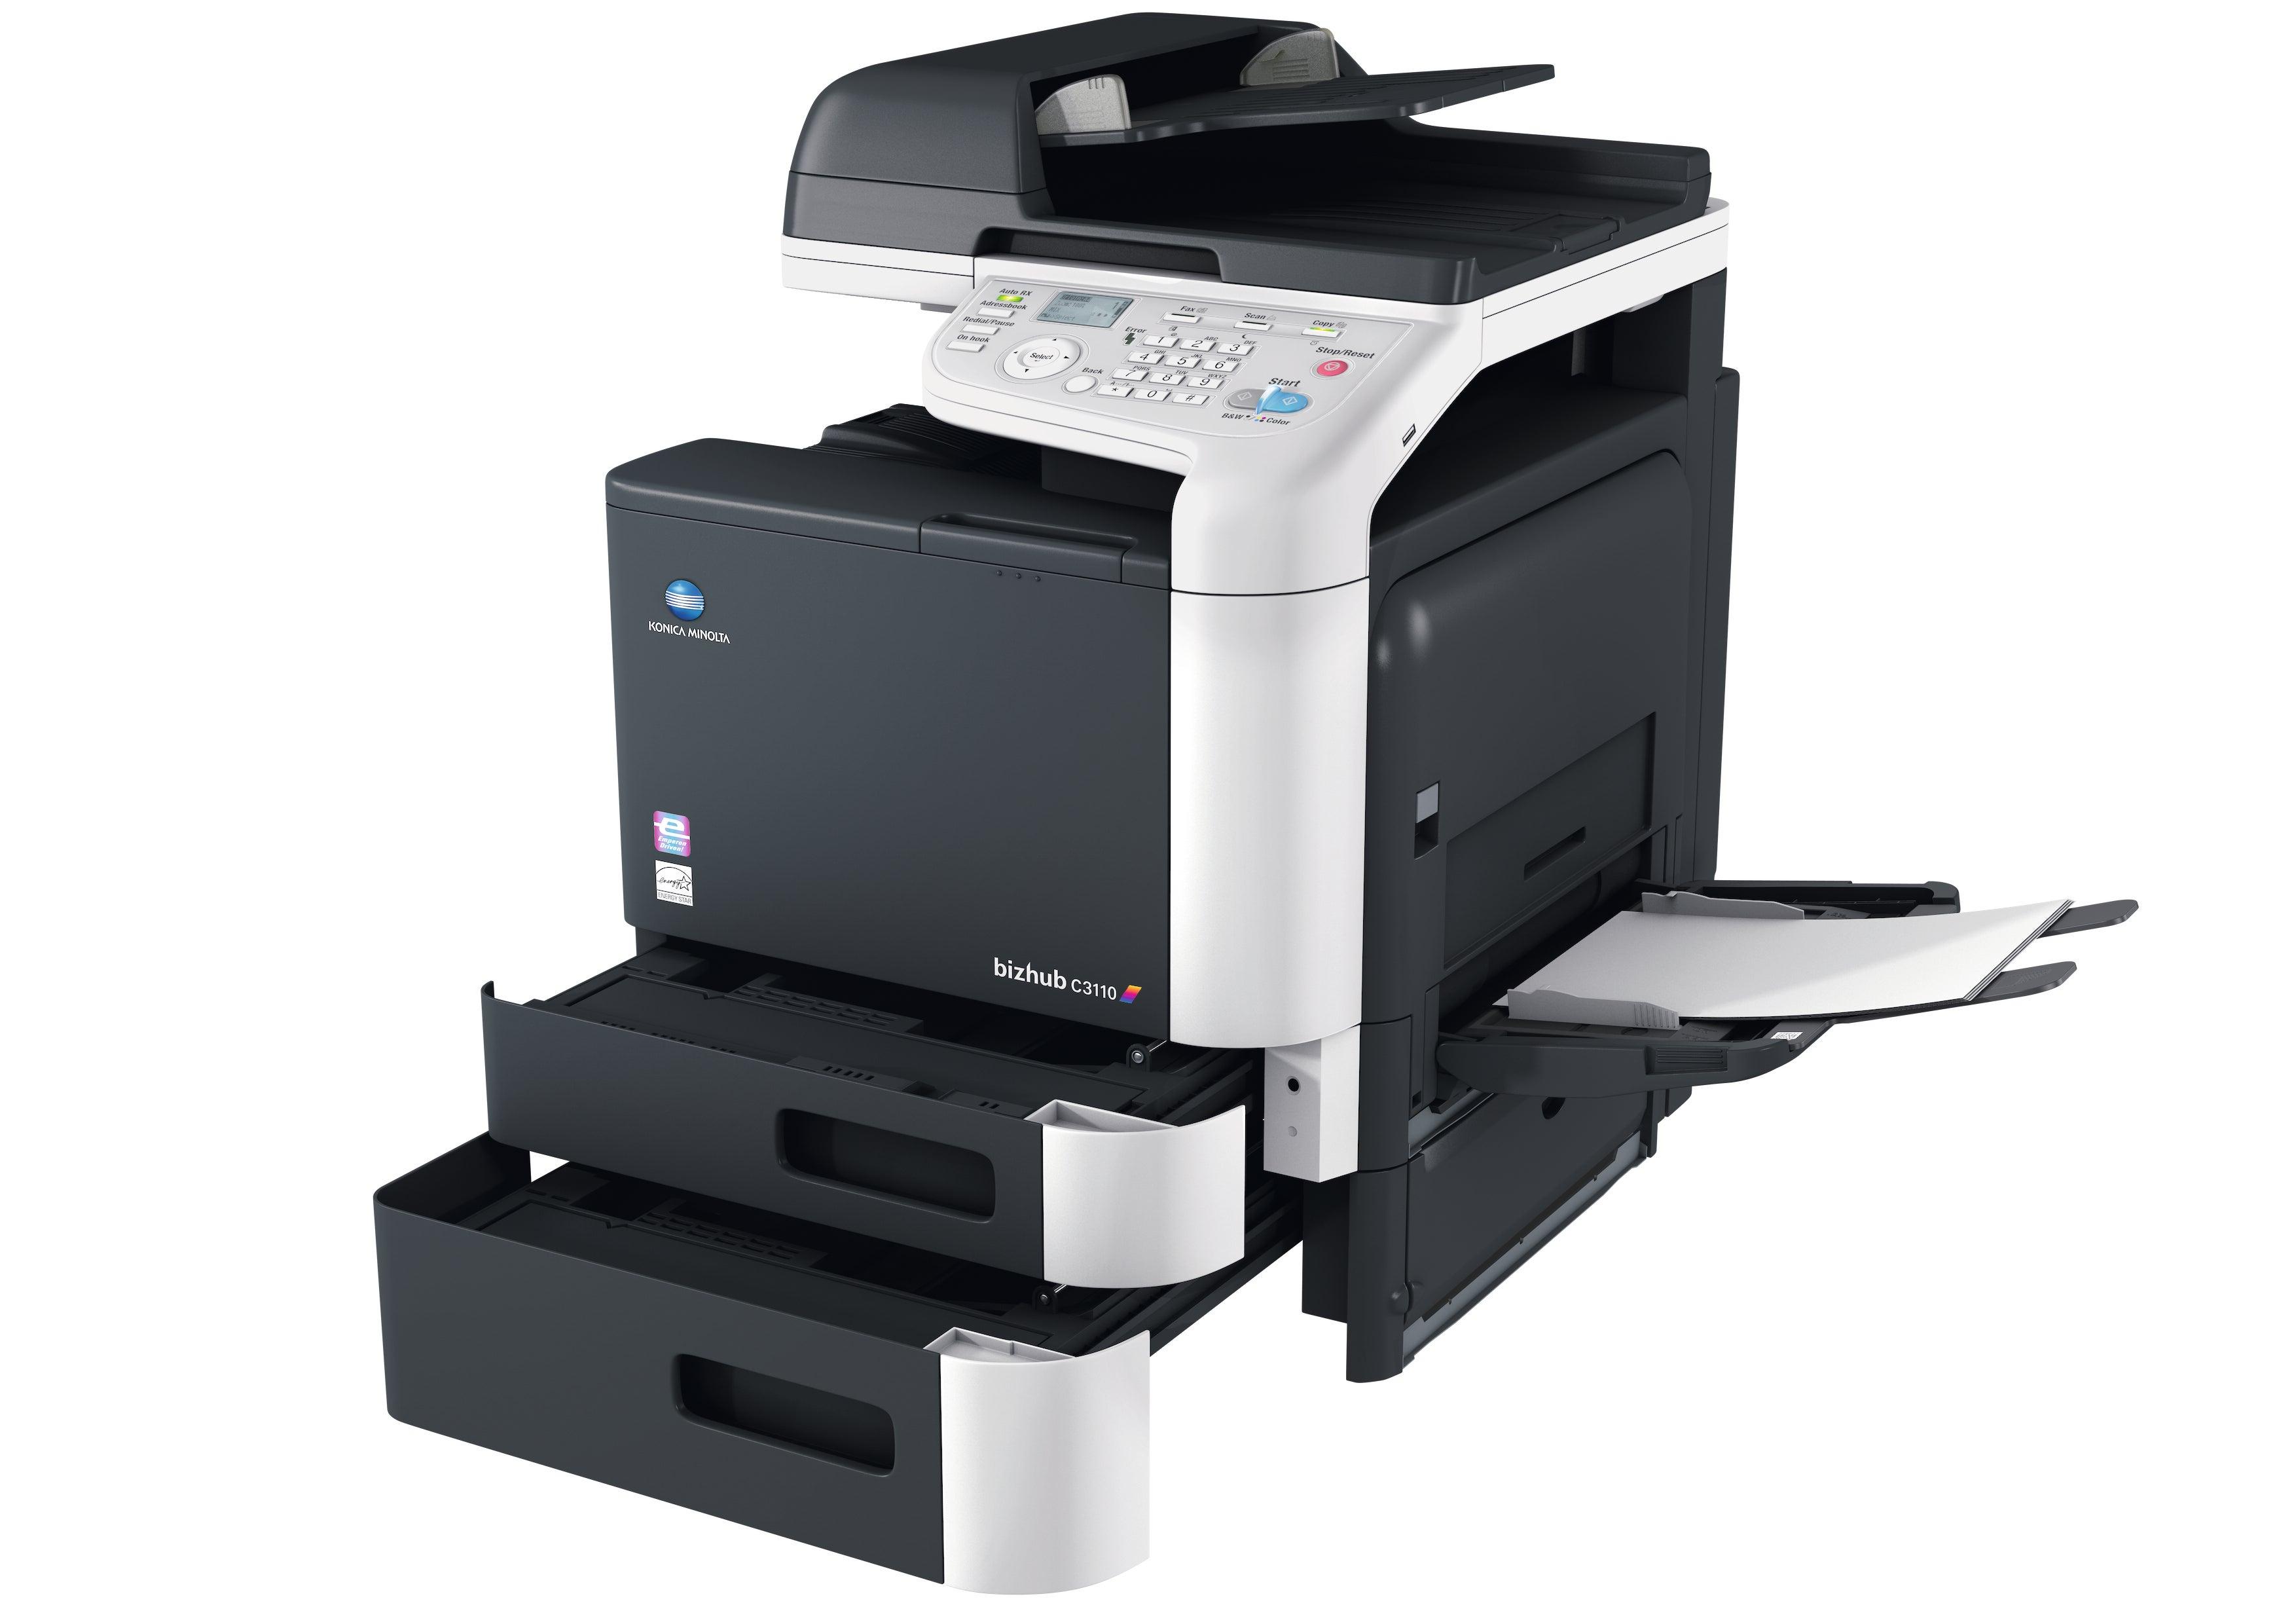 Konica Minolta bizhub c3110 office printer (open paper trays)